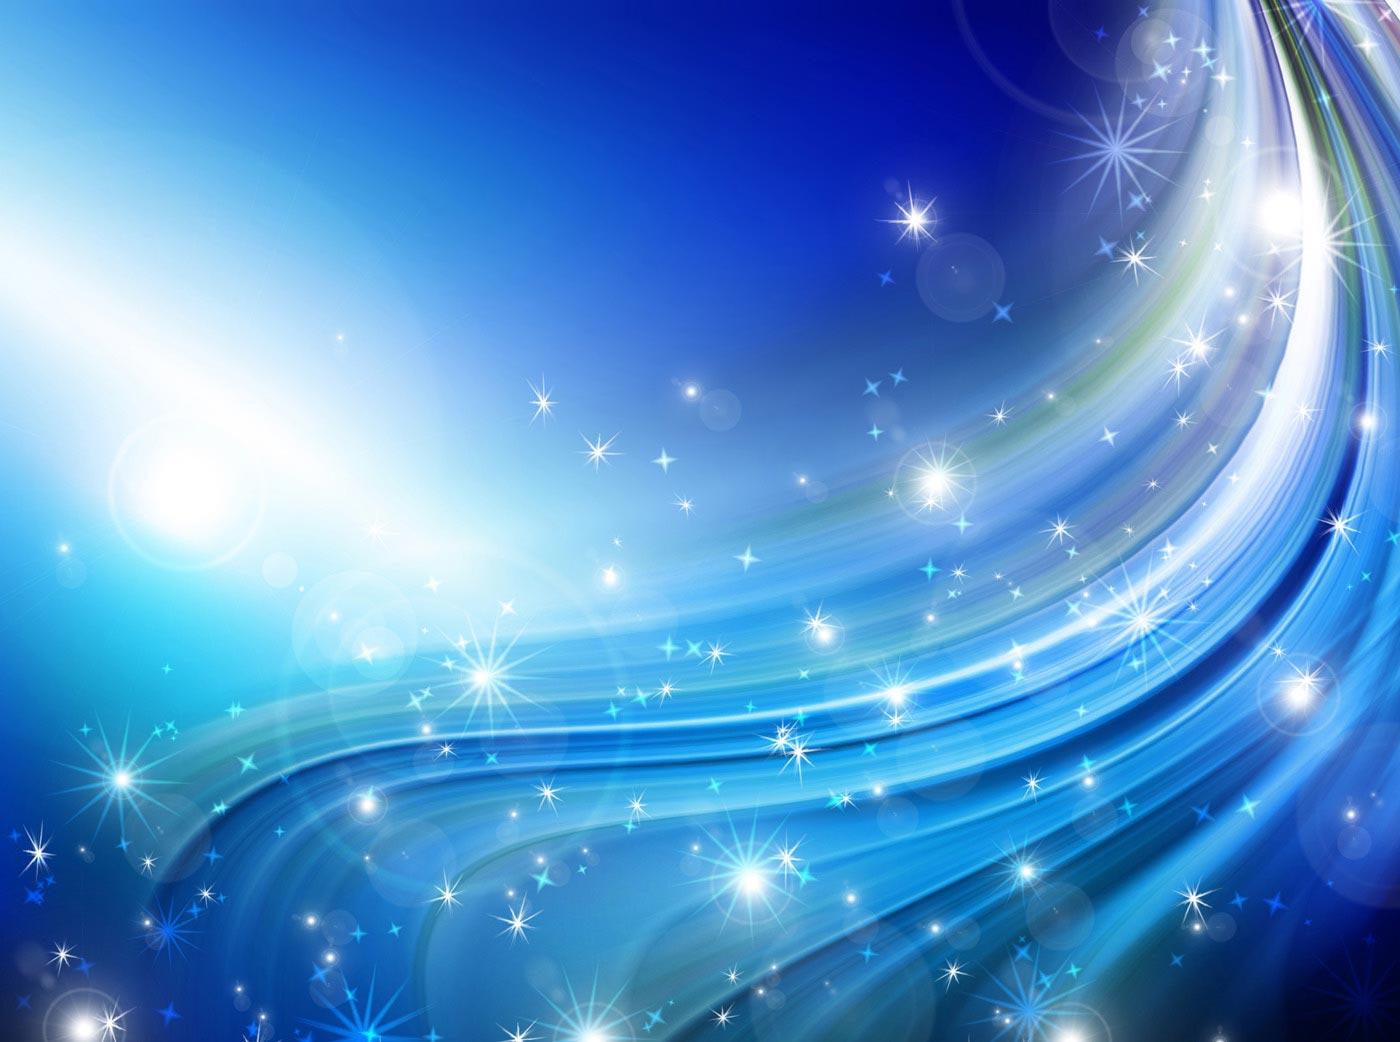 Sfondi Natalizi Luminosi.Sfondo Natalizio Azzurro Sfondo Desktop Natalizio Azzurro